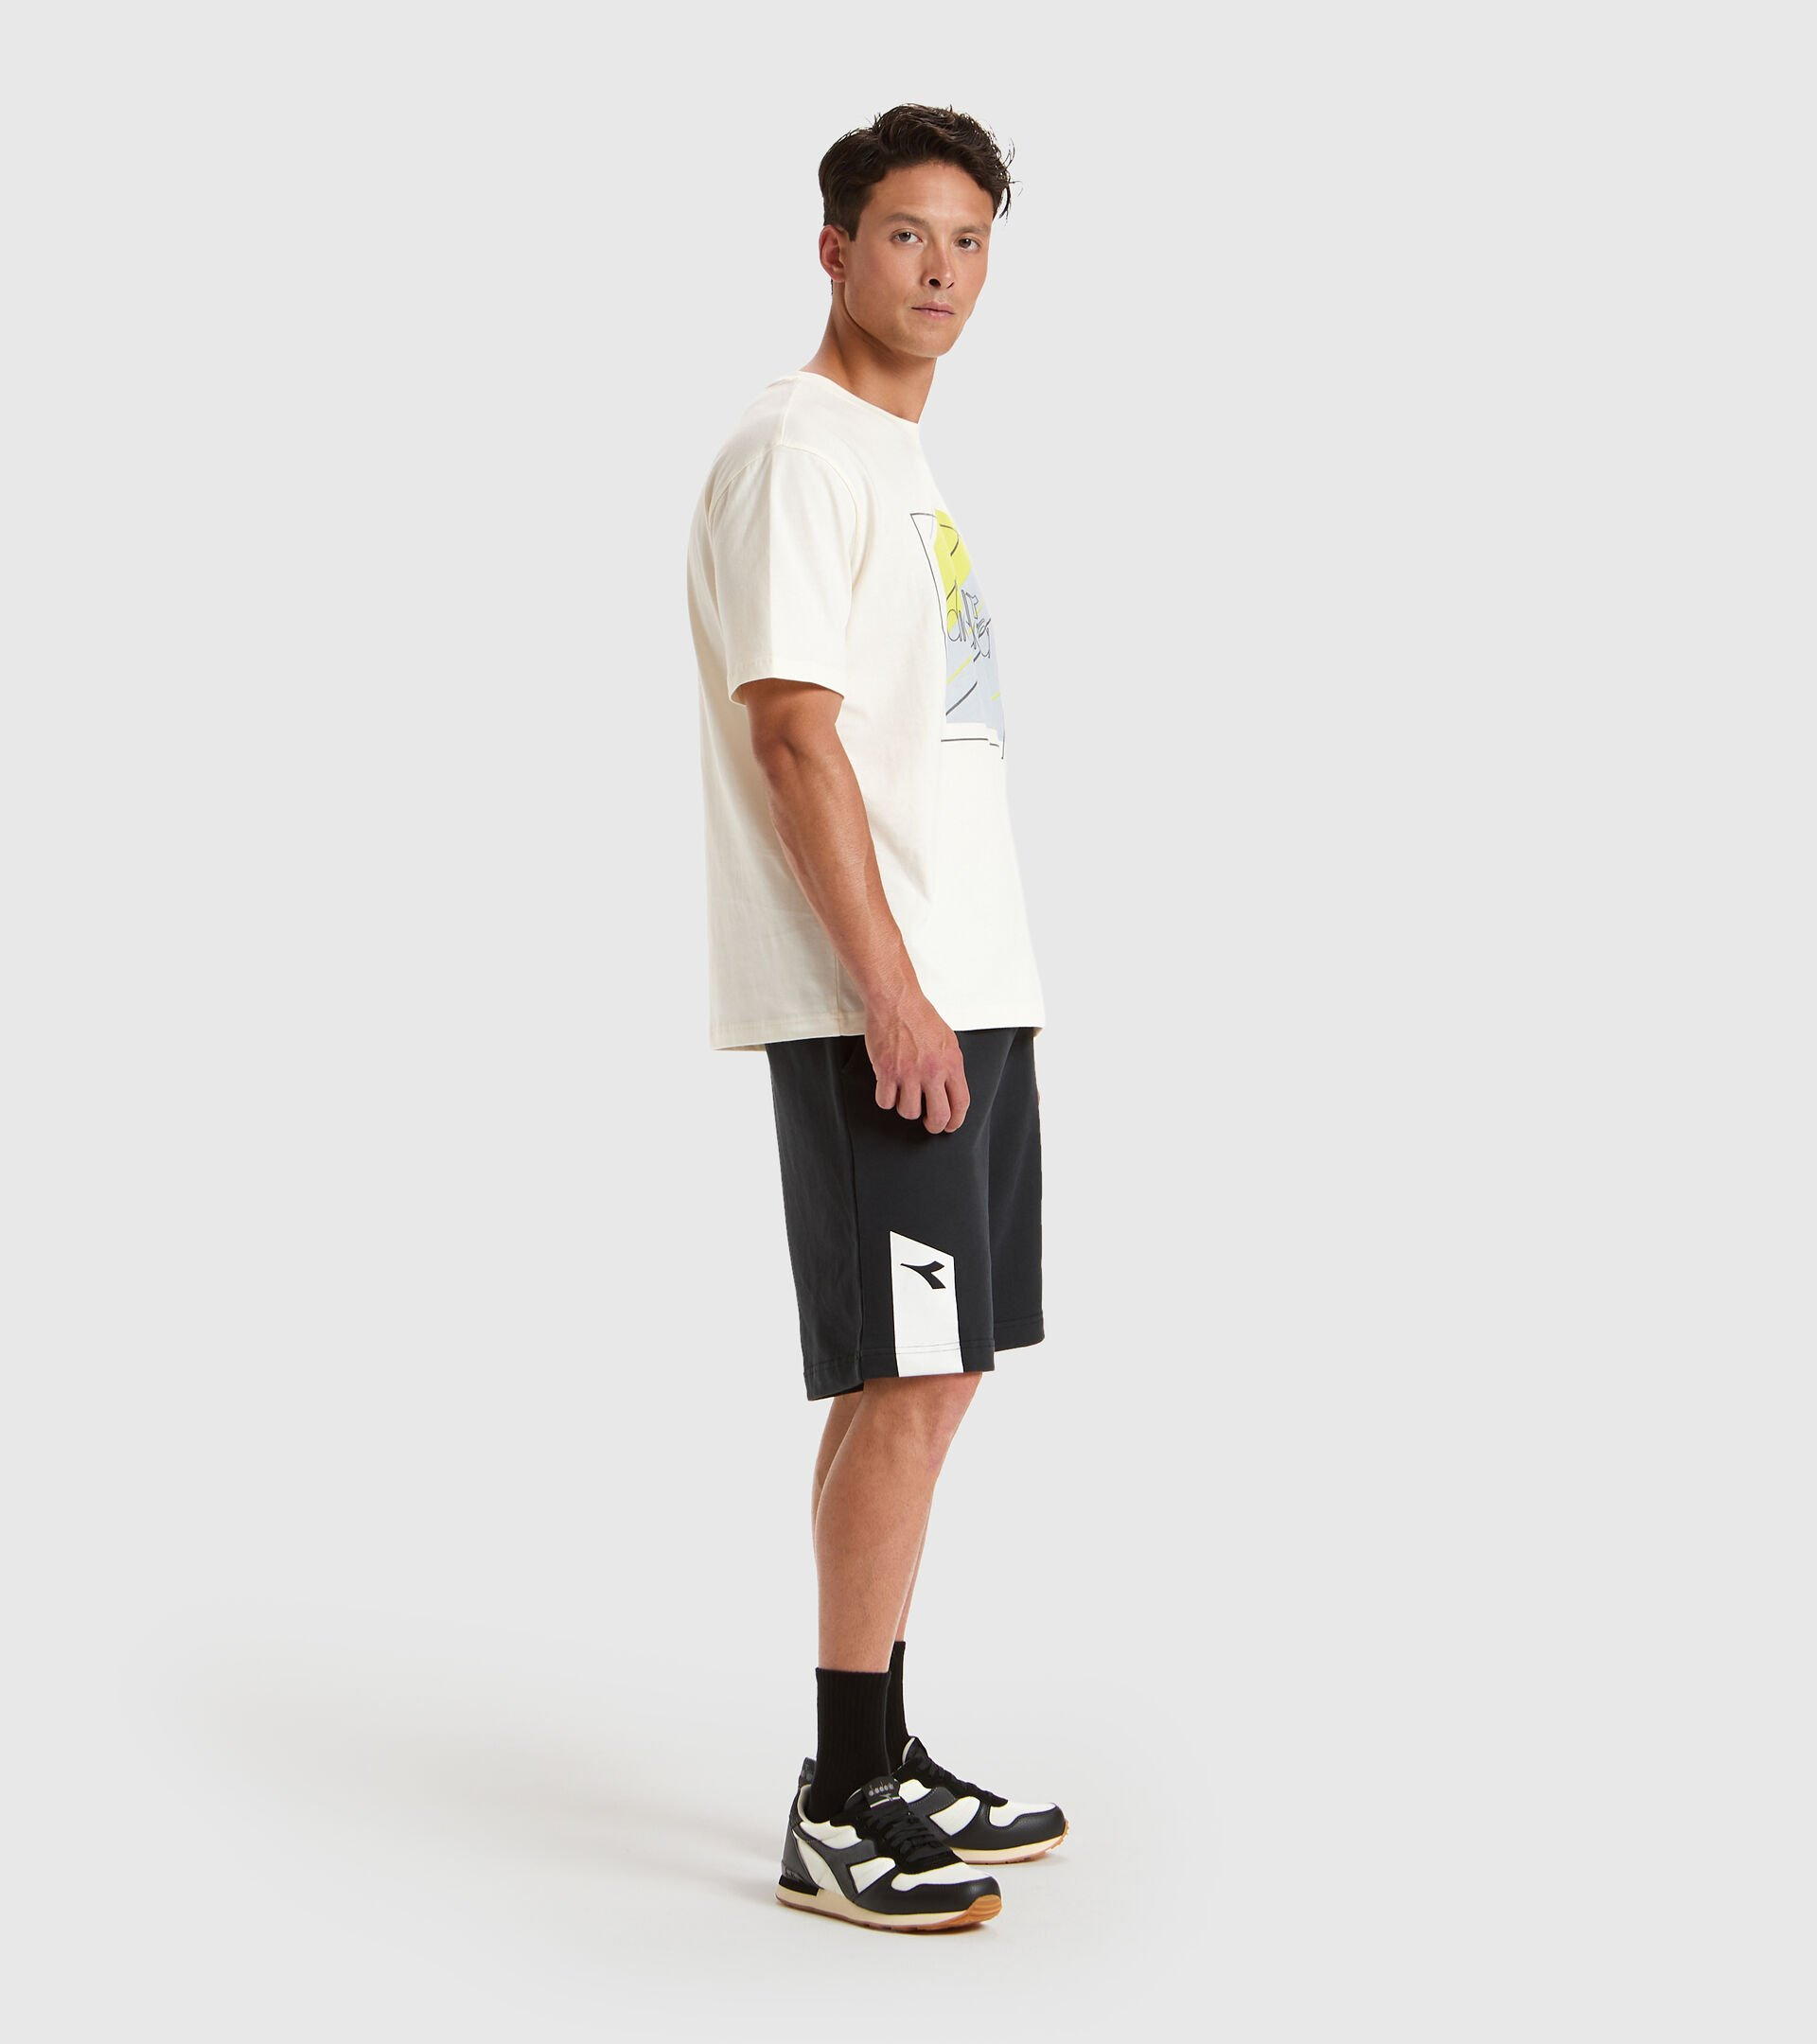 Apparel Sportswear UOMO T-SHIRT SS 5PALLLE URBANITY WHITE Diadora